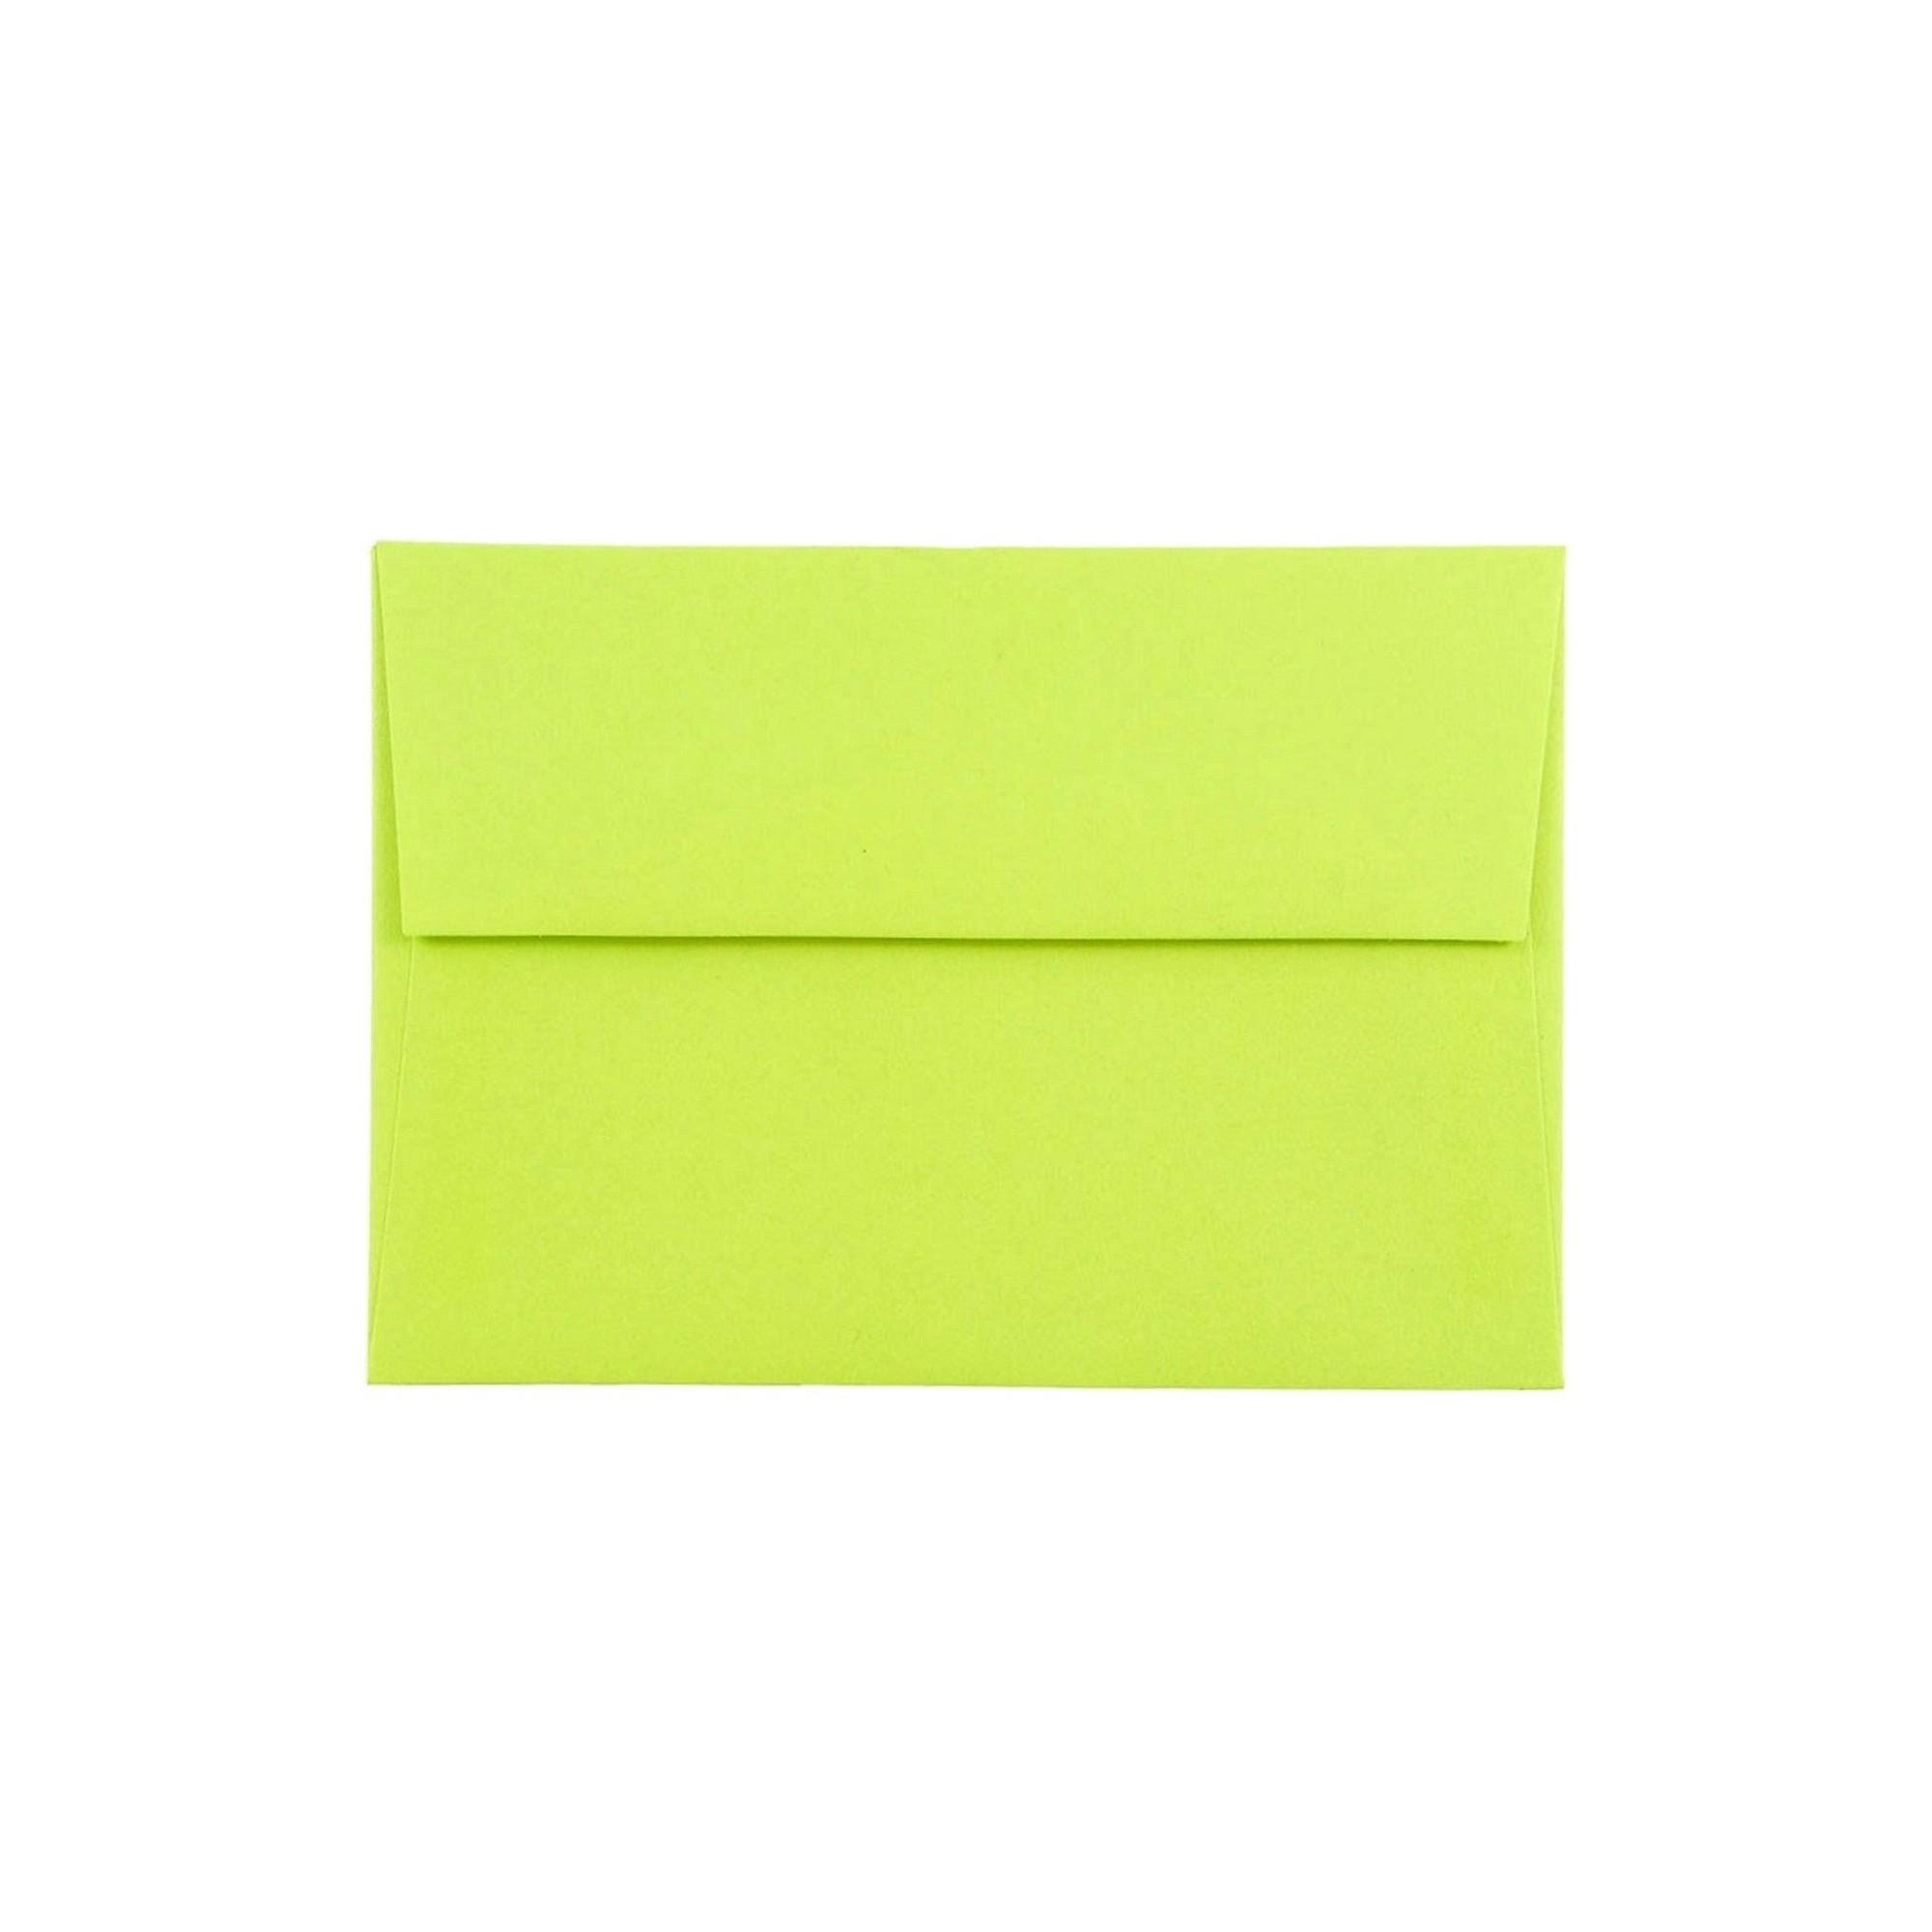 Jam Paper Brite Hue 4bar A1 Envelopes, 3 5/8 x 5 1/8, 50 per pack, Ultra Lime, New Lime